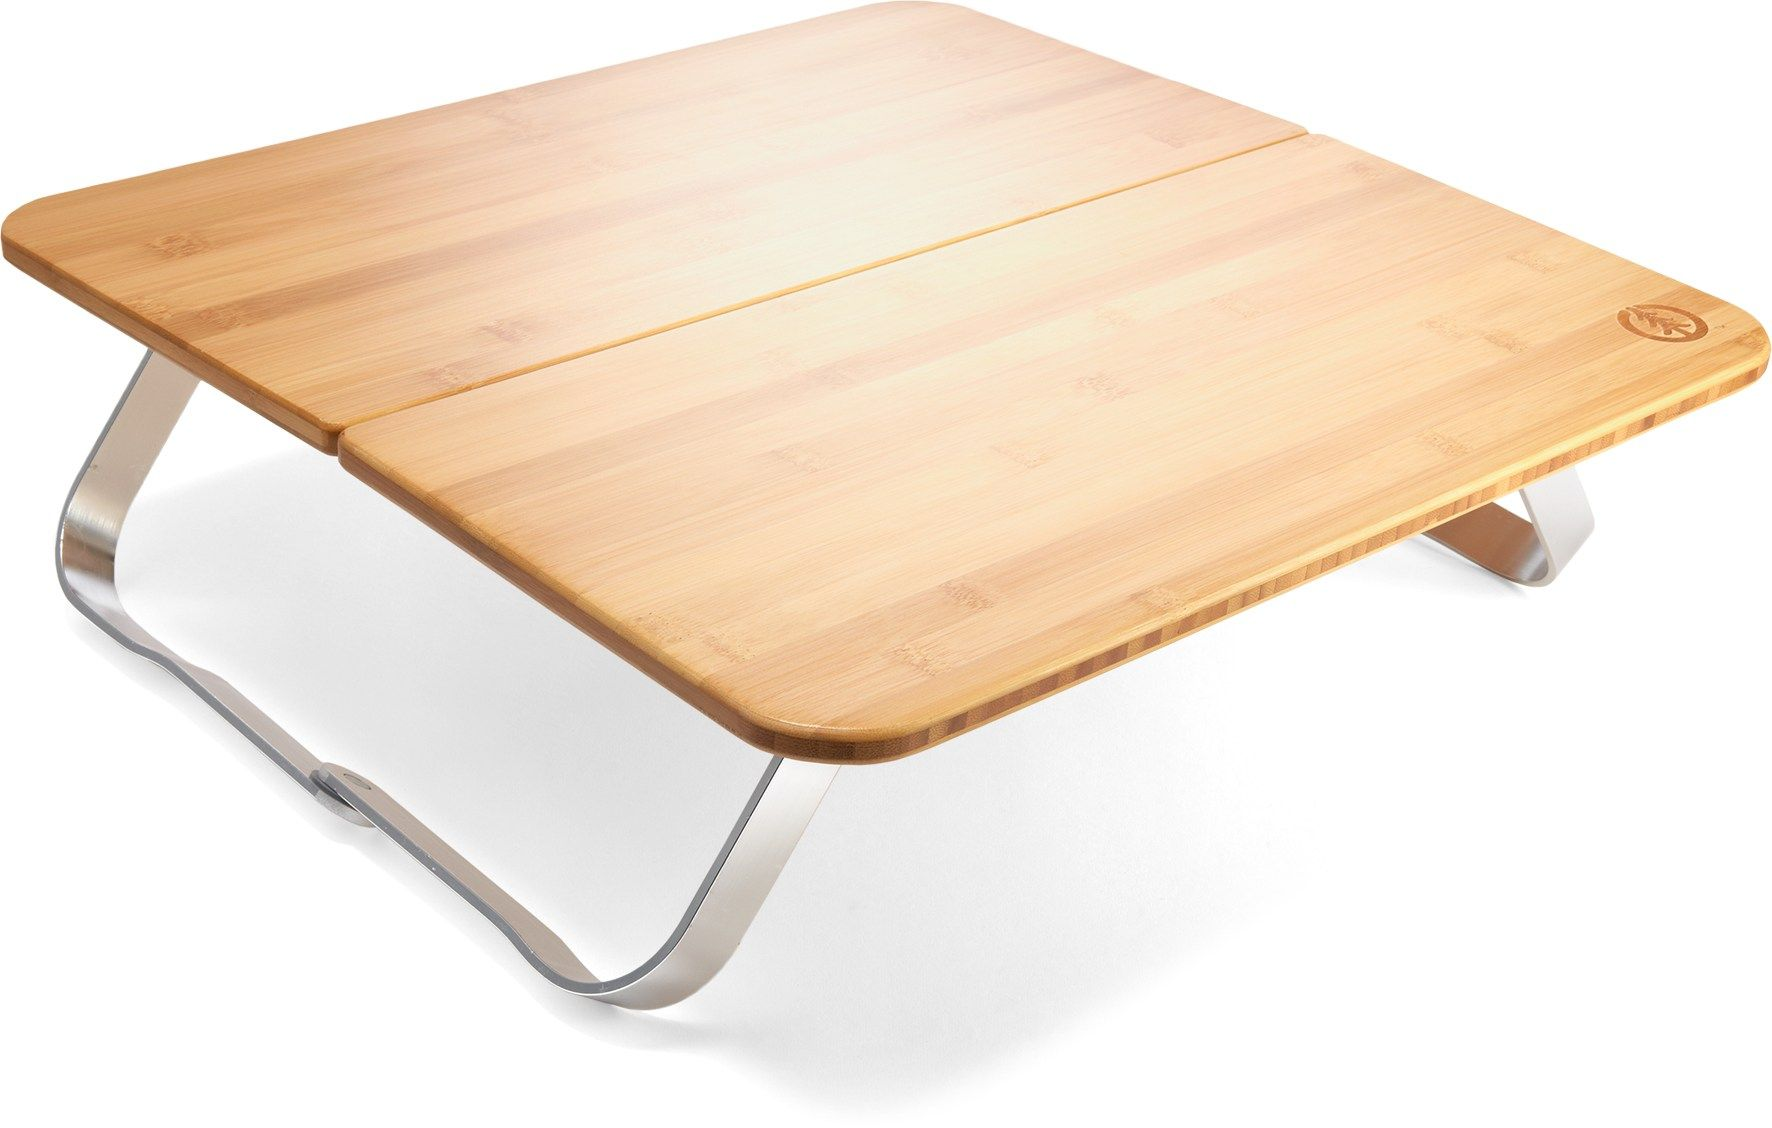 Evrgrn Picnic Table Rei Co Op Portable Picnic Table Folding Picnic Table Picnic Table